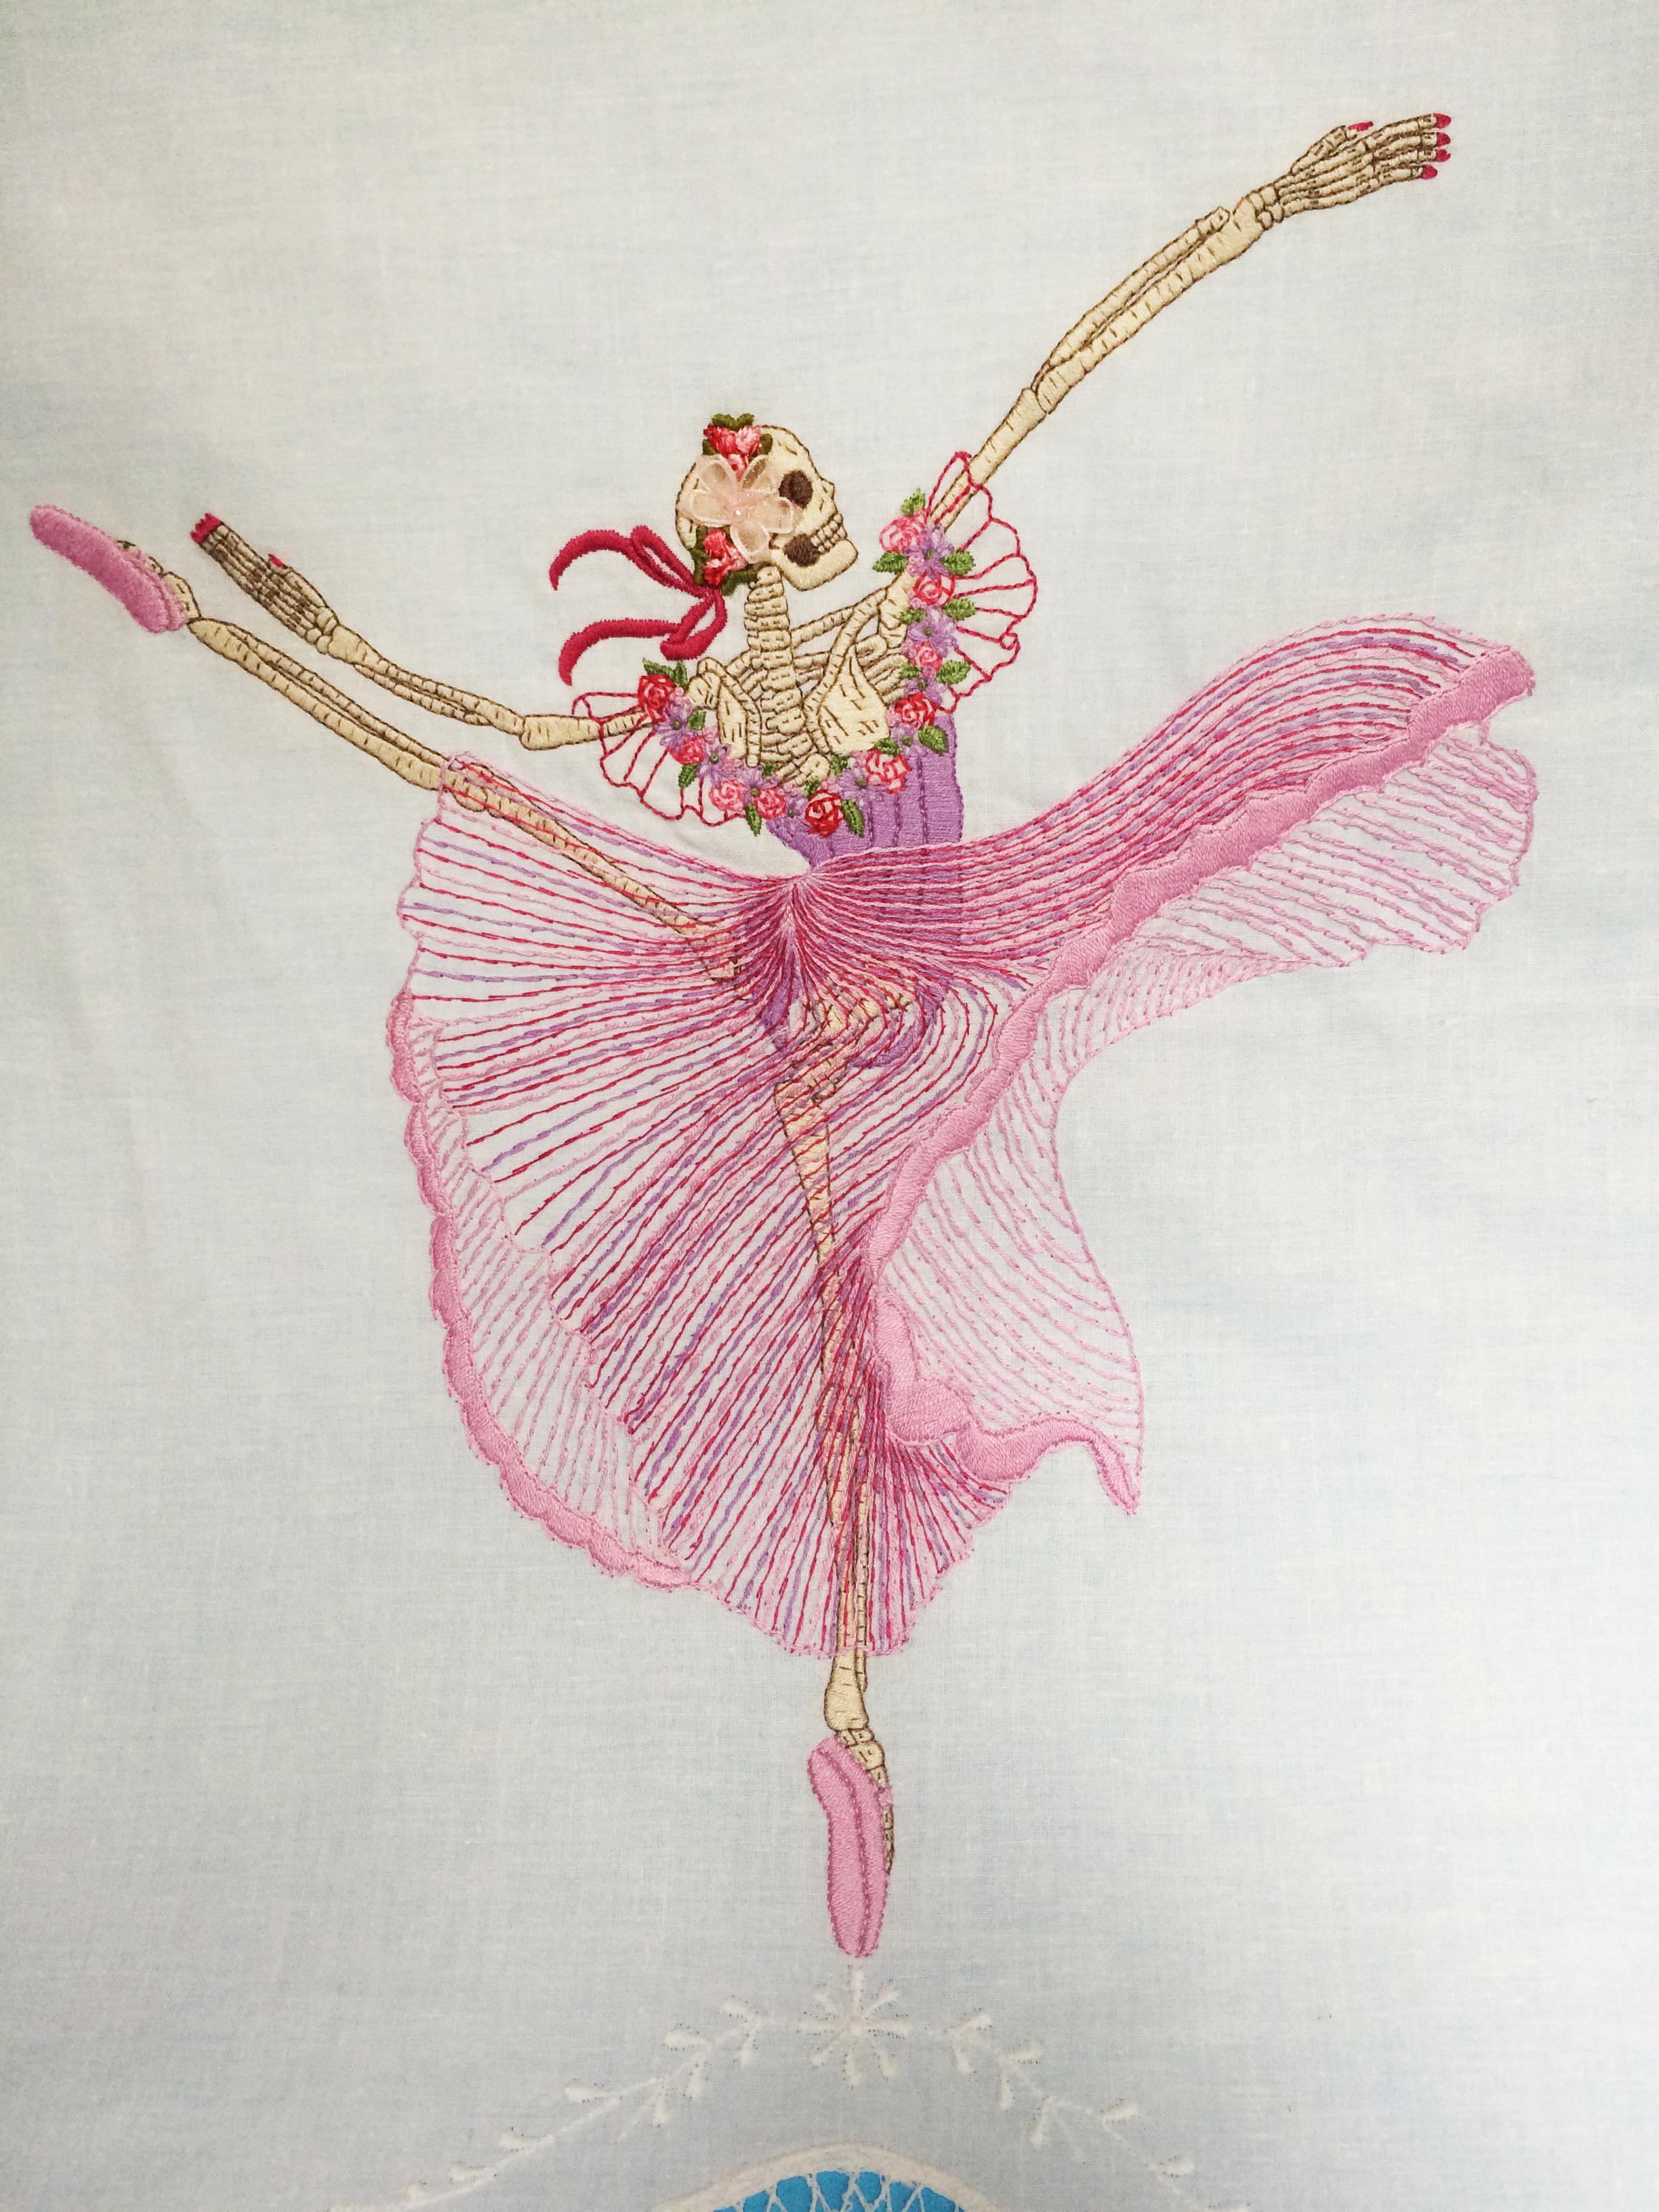 "Skeleton Ballerina,   Embroidered Illustration on Vintage Lace. 20""x15""  . 2015."